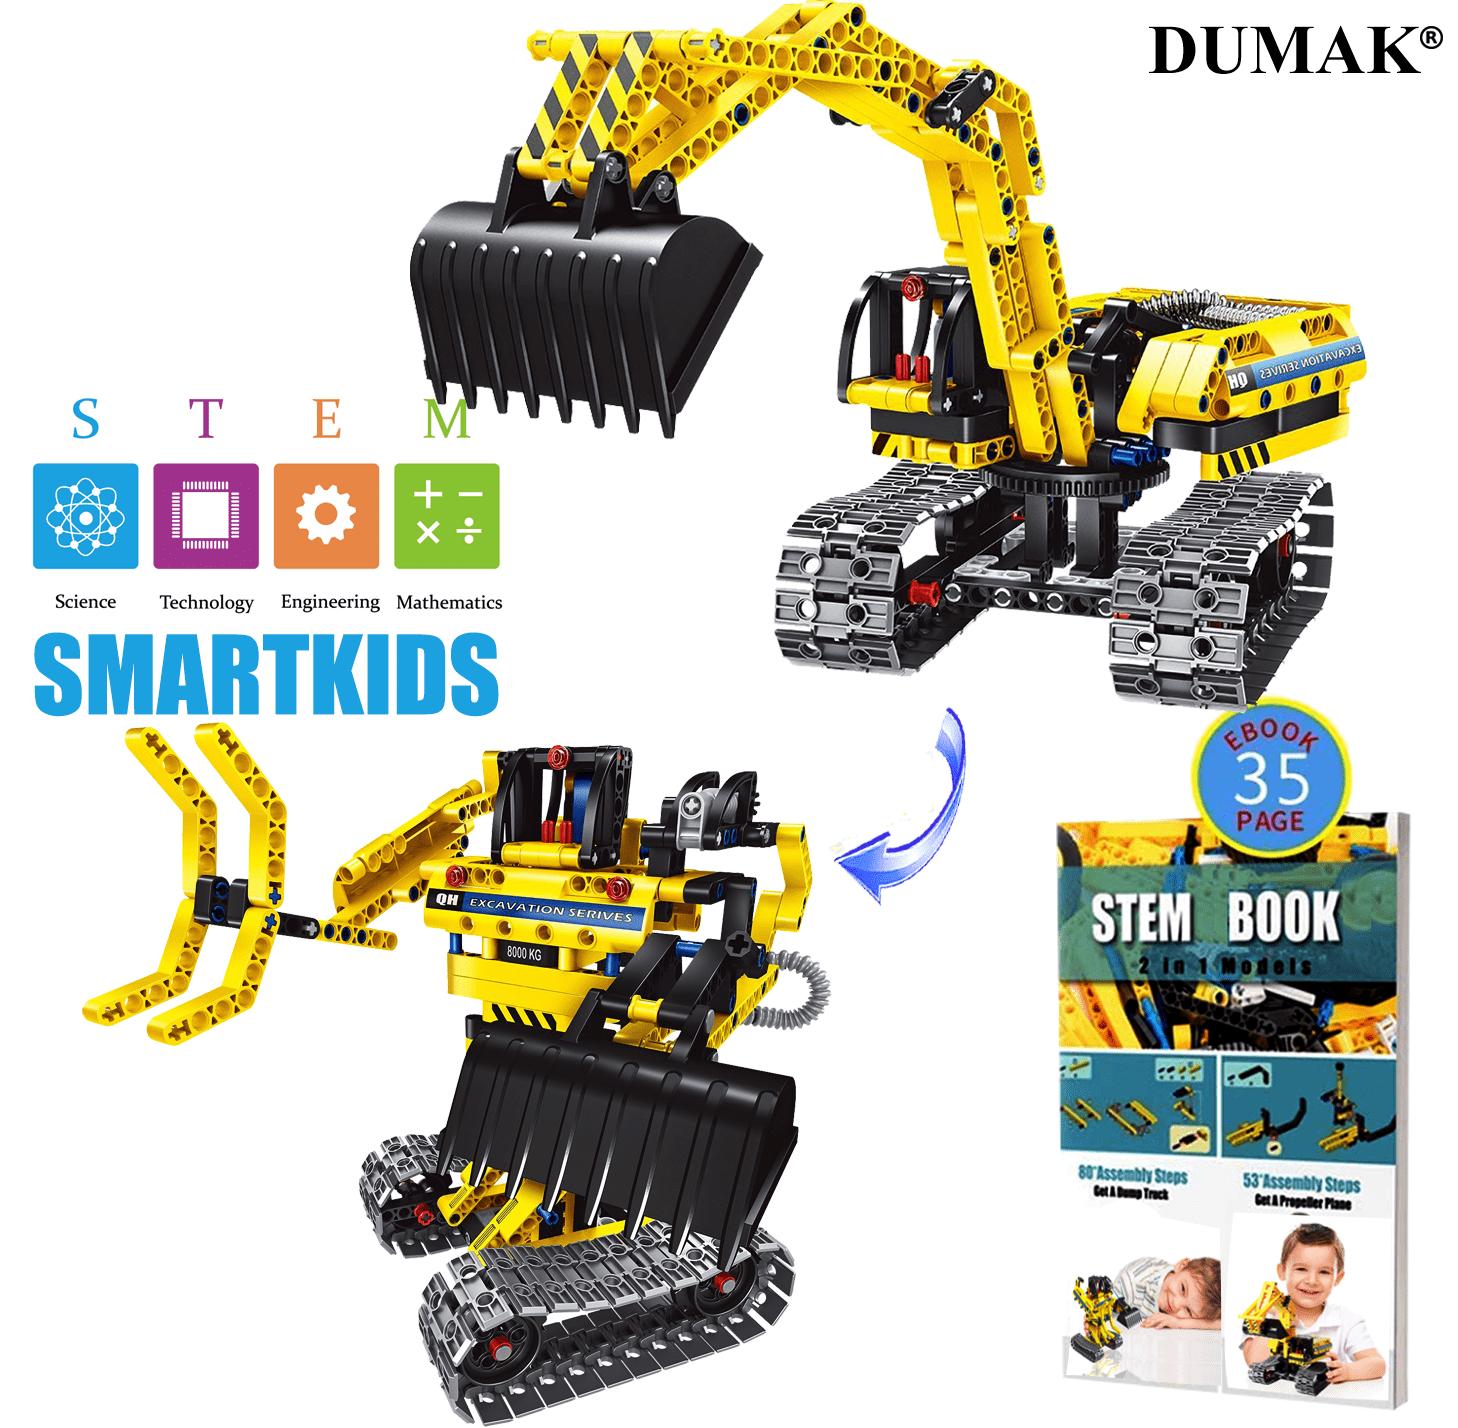 Building Blocks Set STEM Toy, 342pcs Engineering Bricks Construction Kit, Educational Building Excavator and Excavator Robot